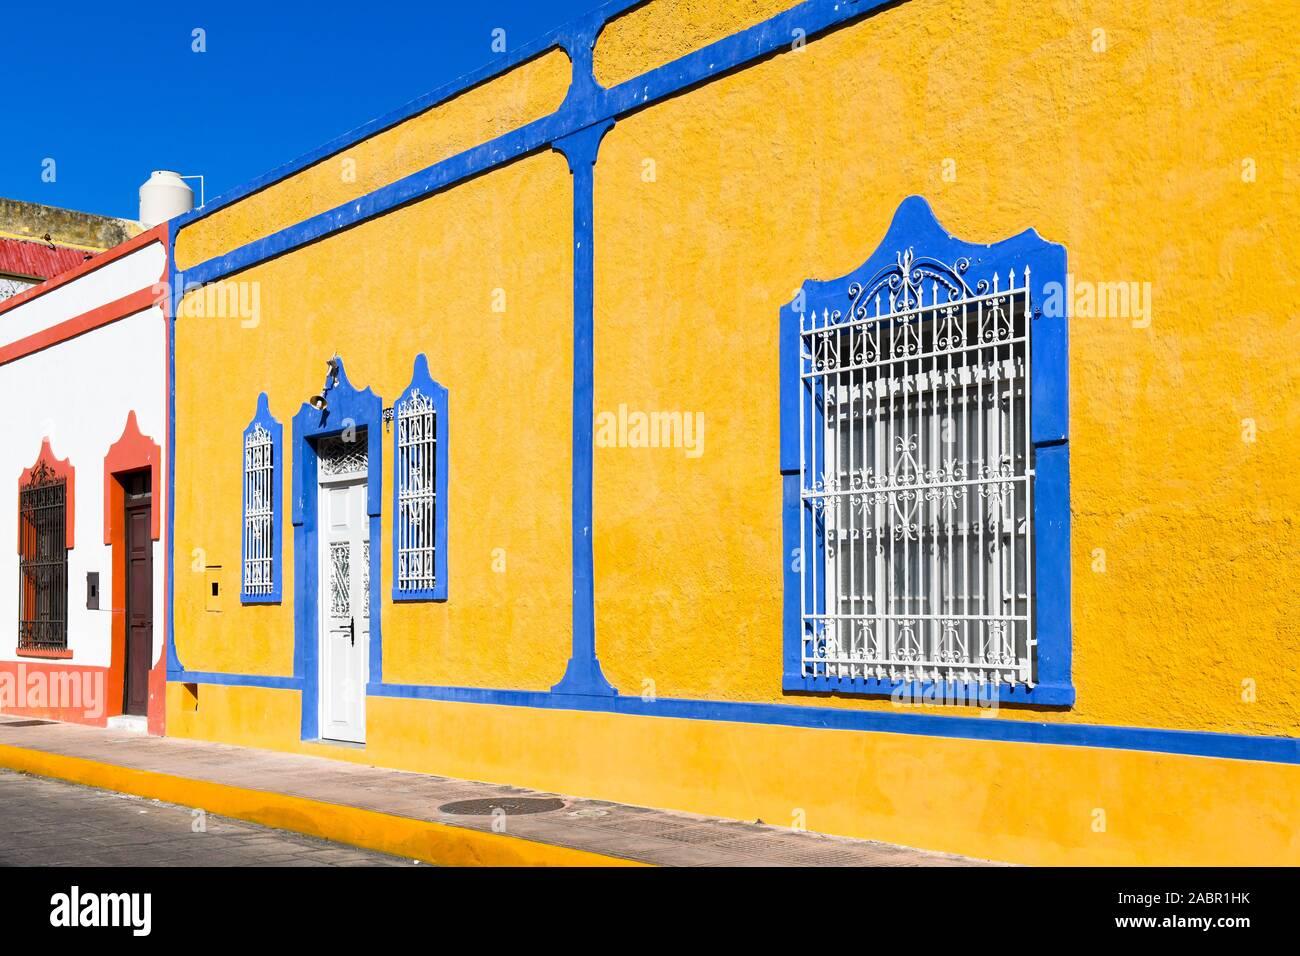 Colonial style architecture, Merida City Center, Mexico Stock Photo